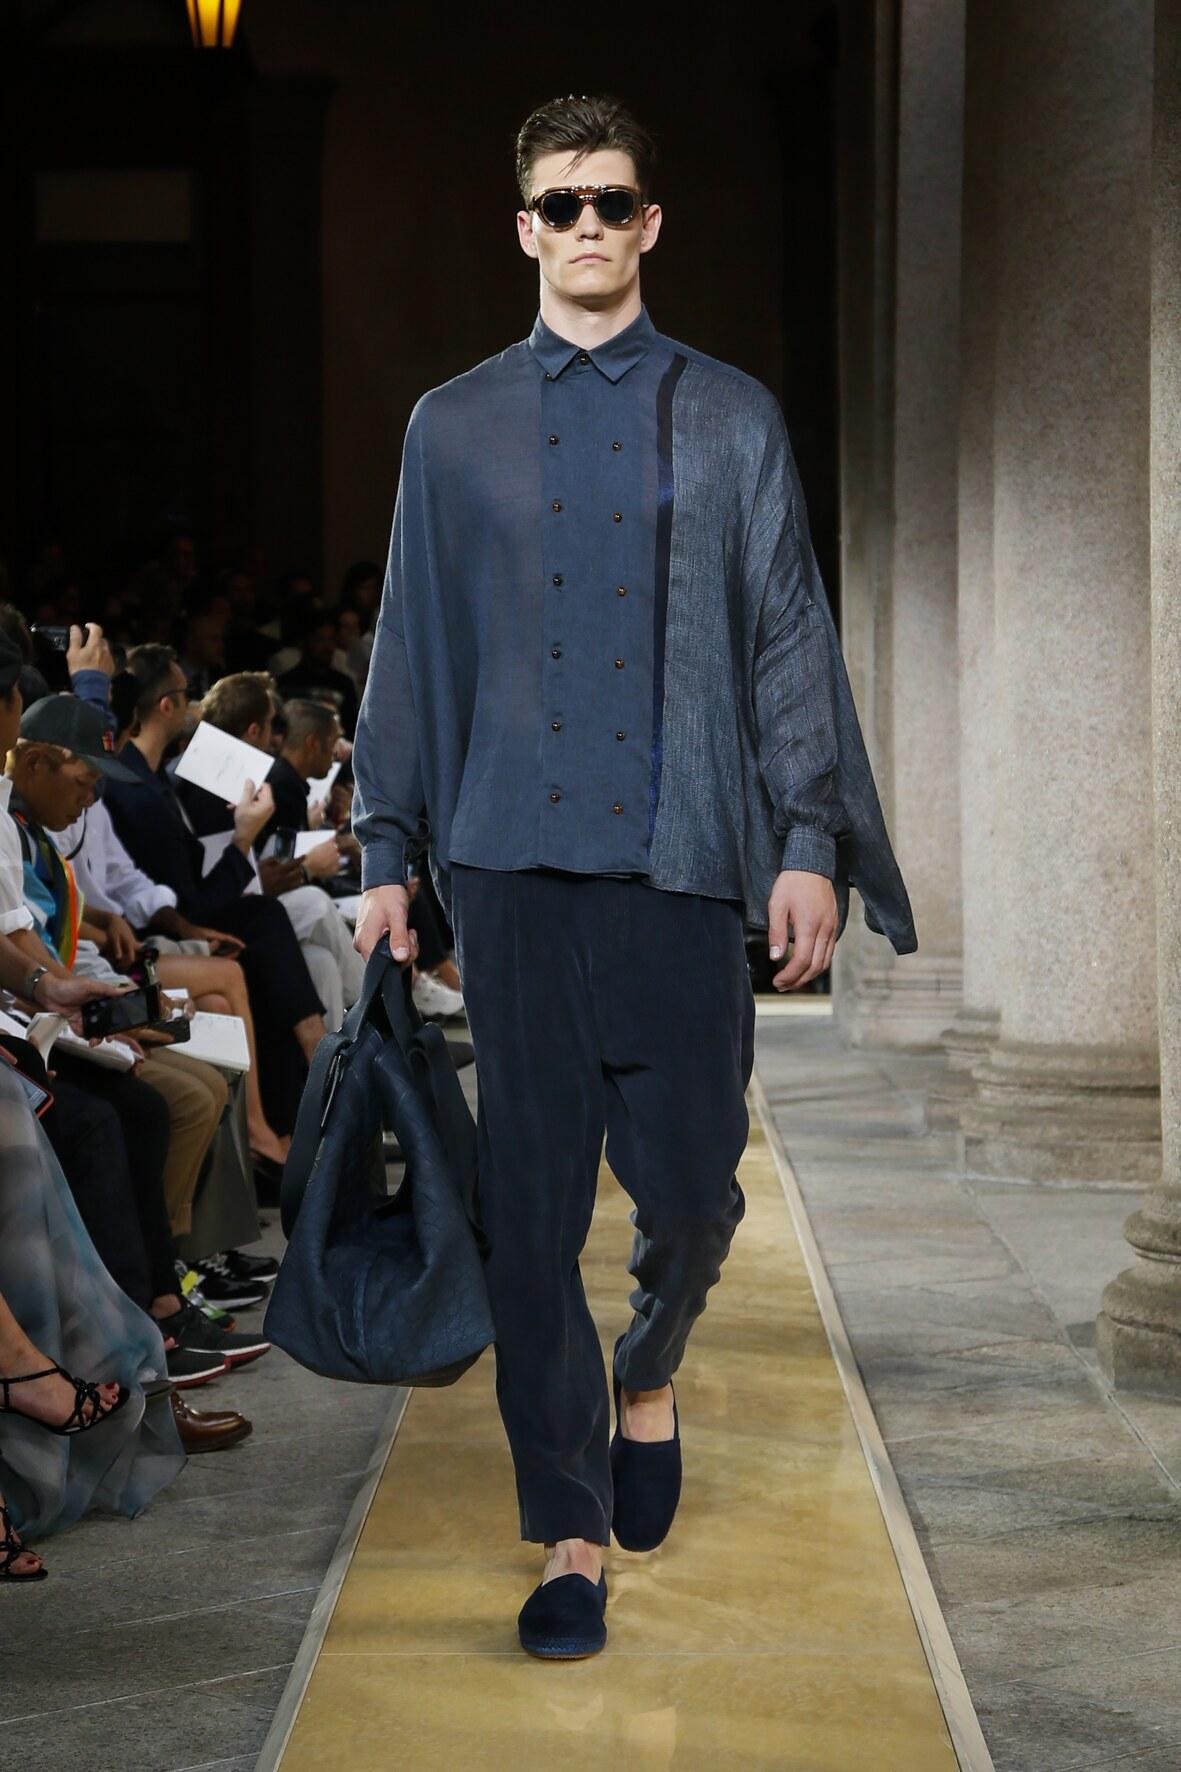 Catwalk Giorgio Armani Man Fashion Show Summer 2020